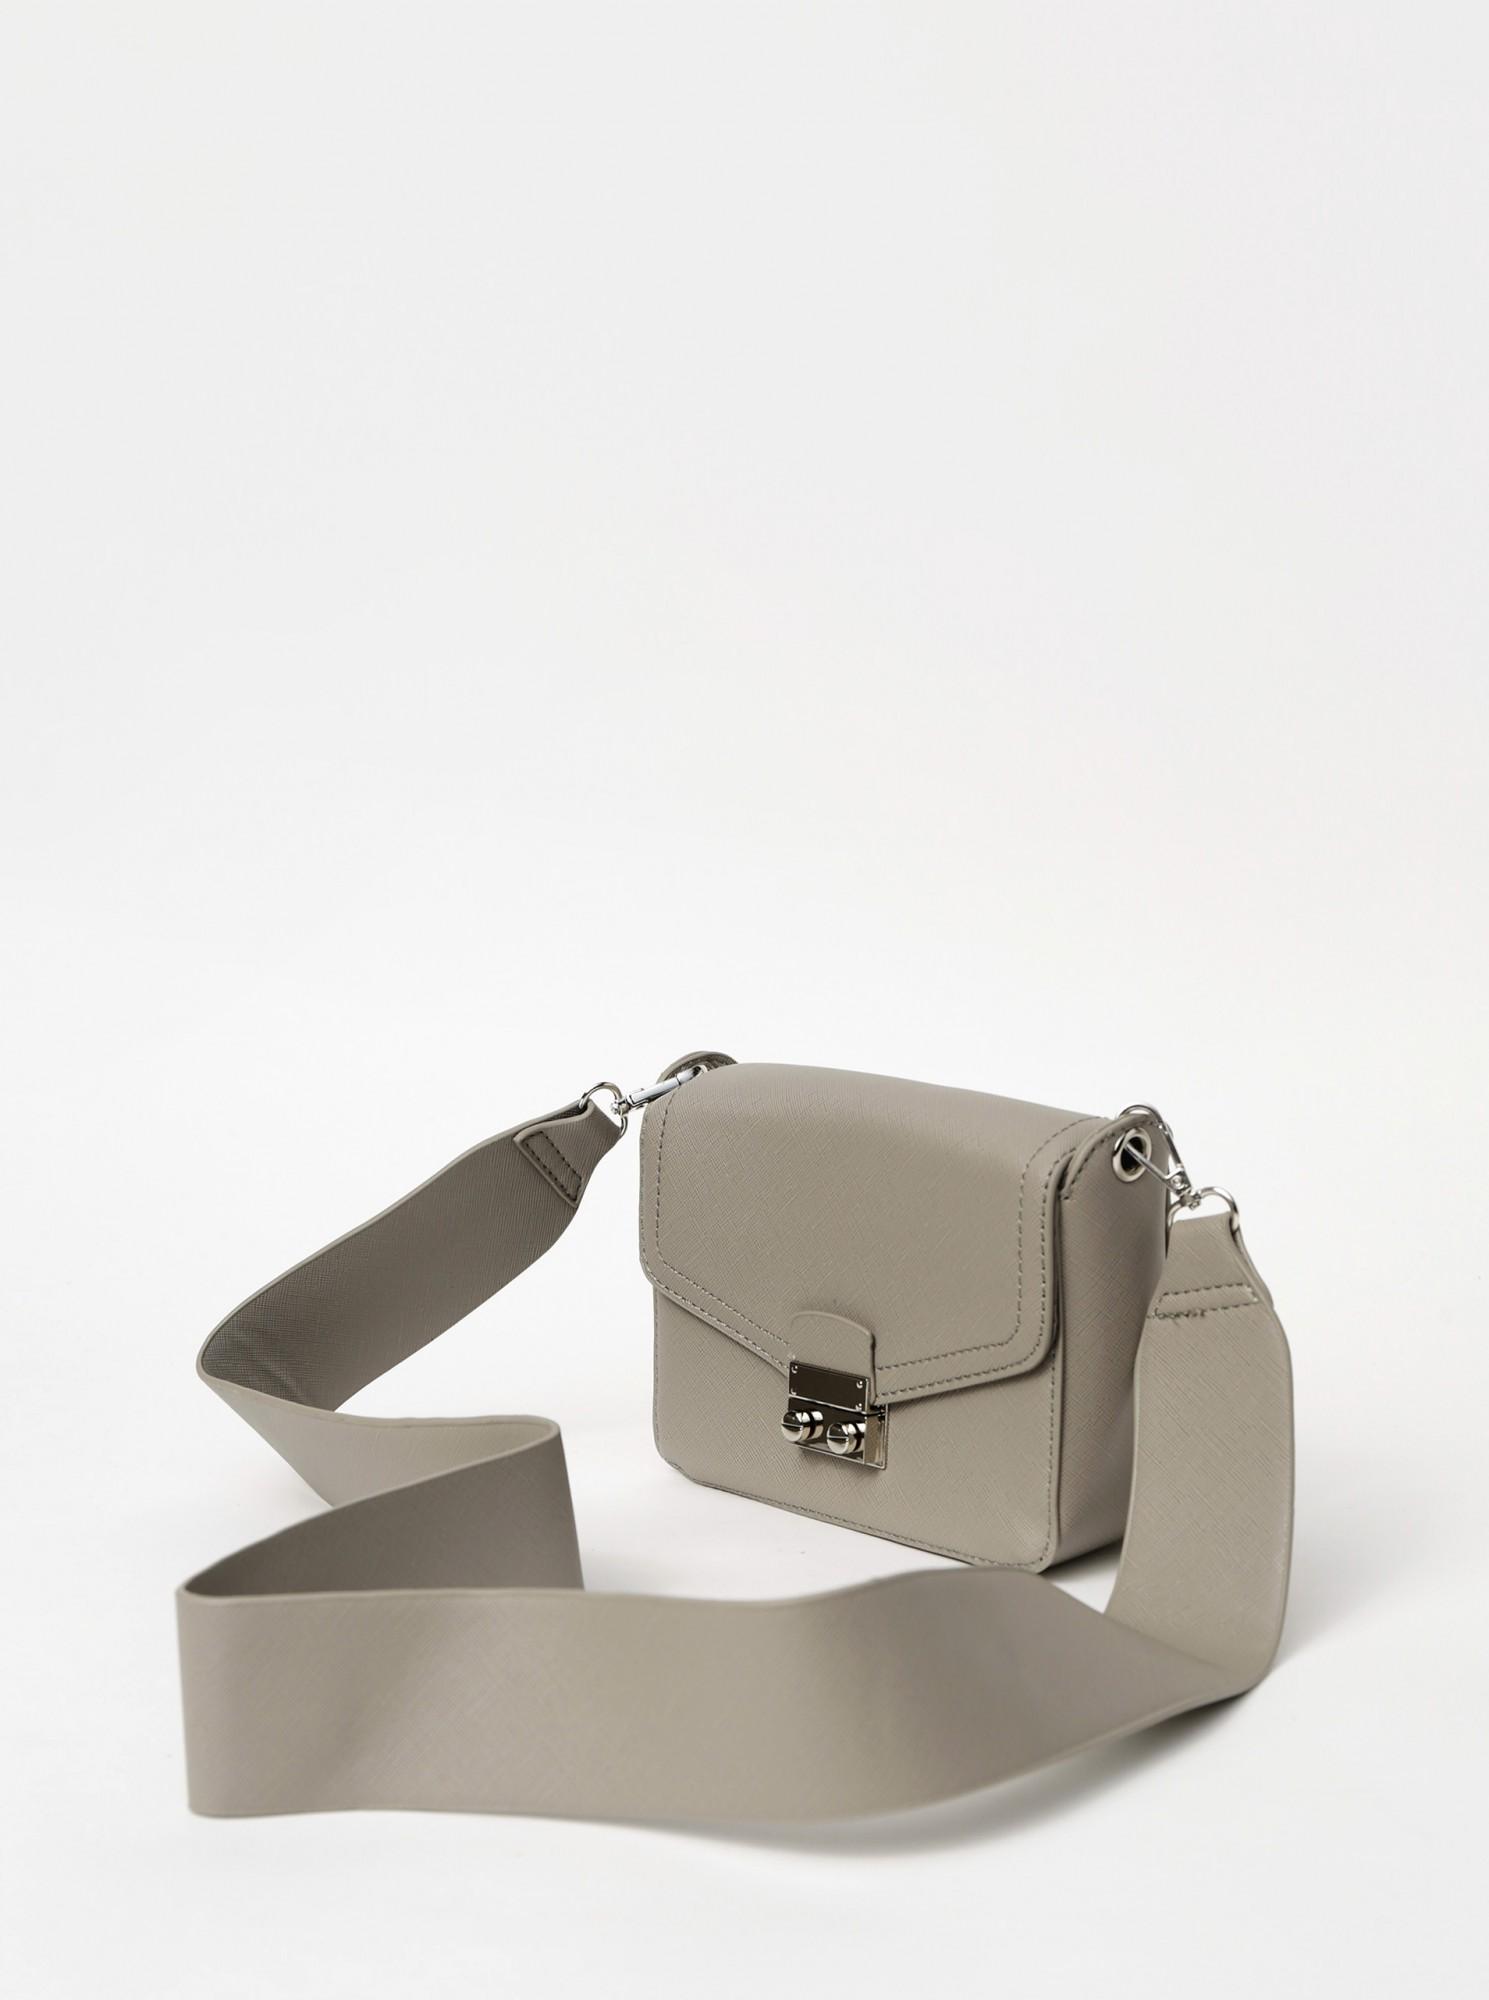 Hailys grey crossbody handbag